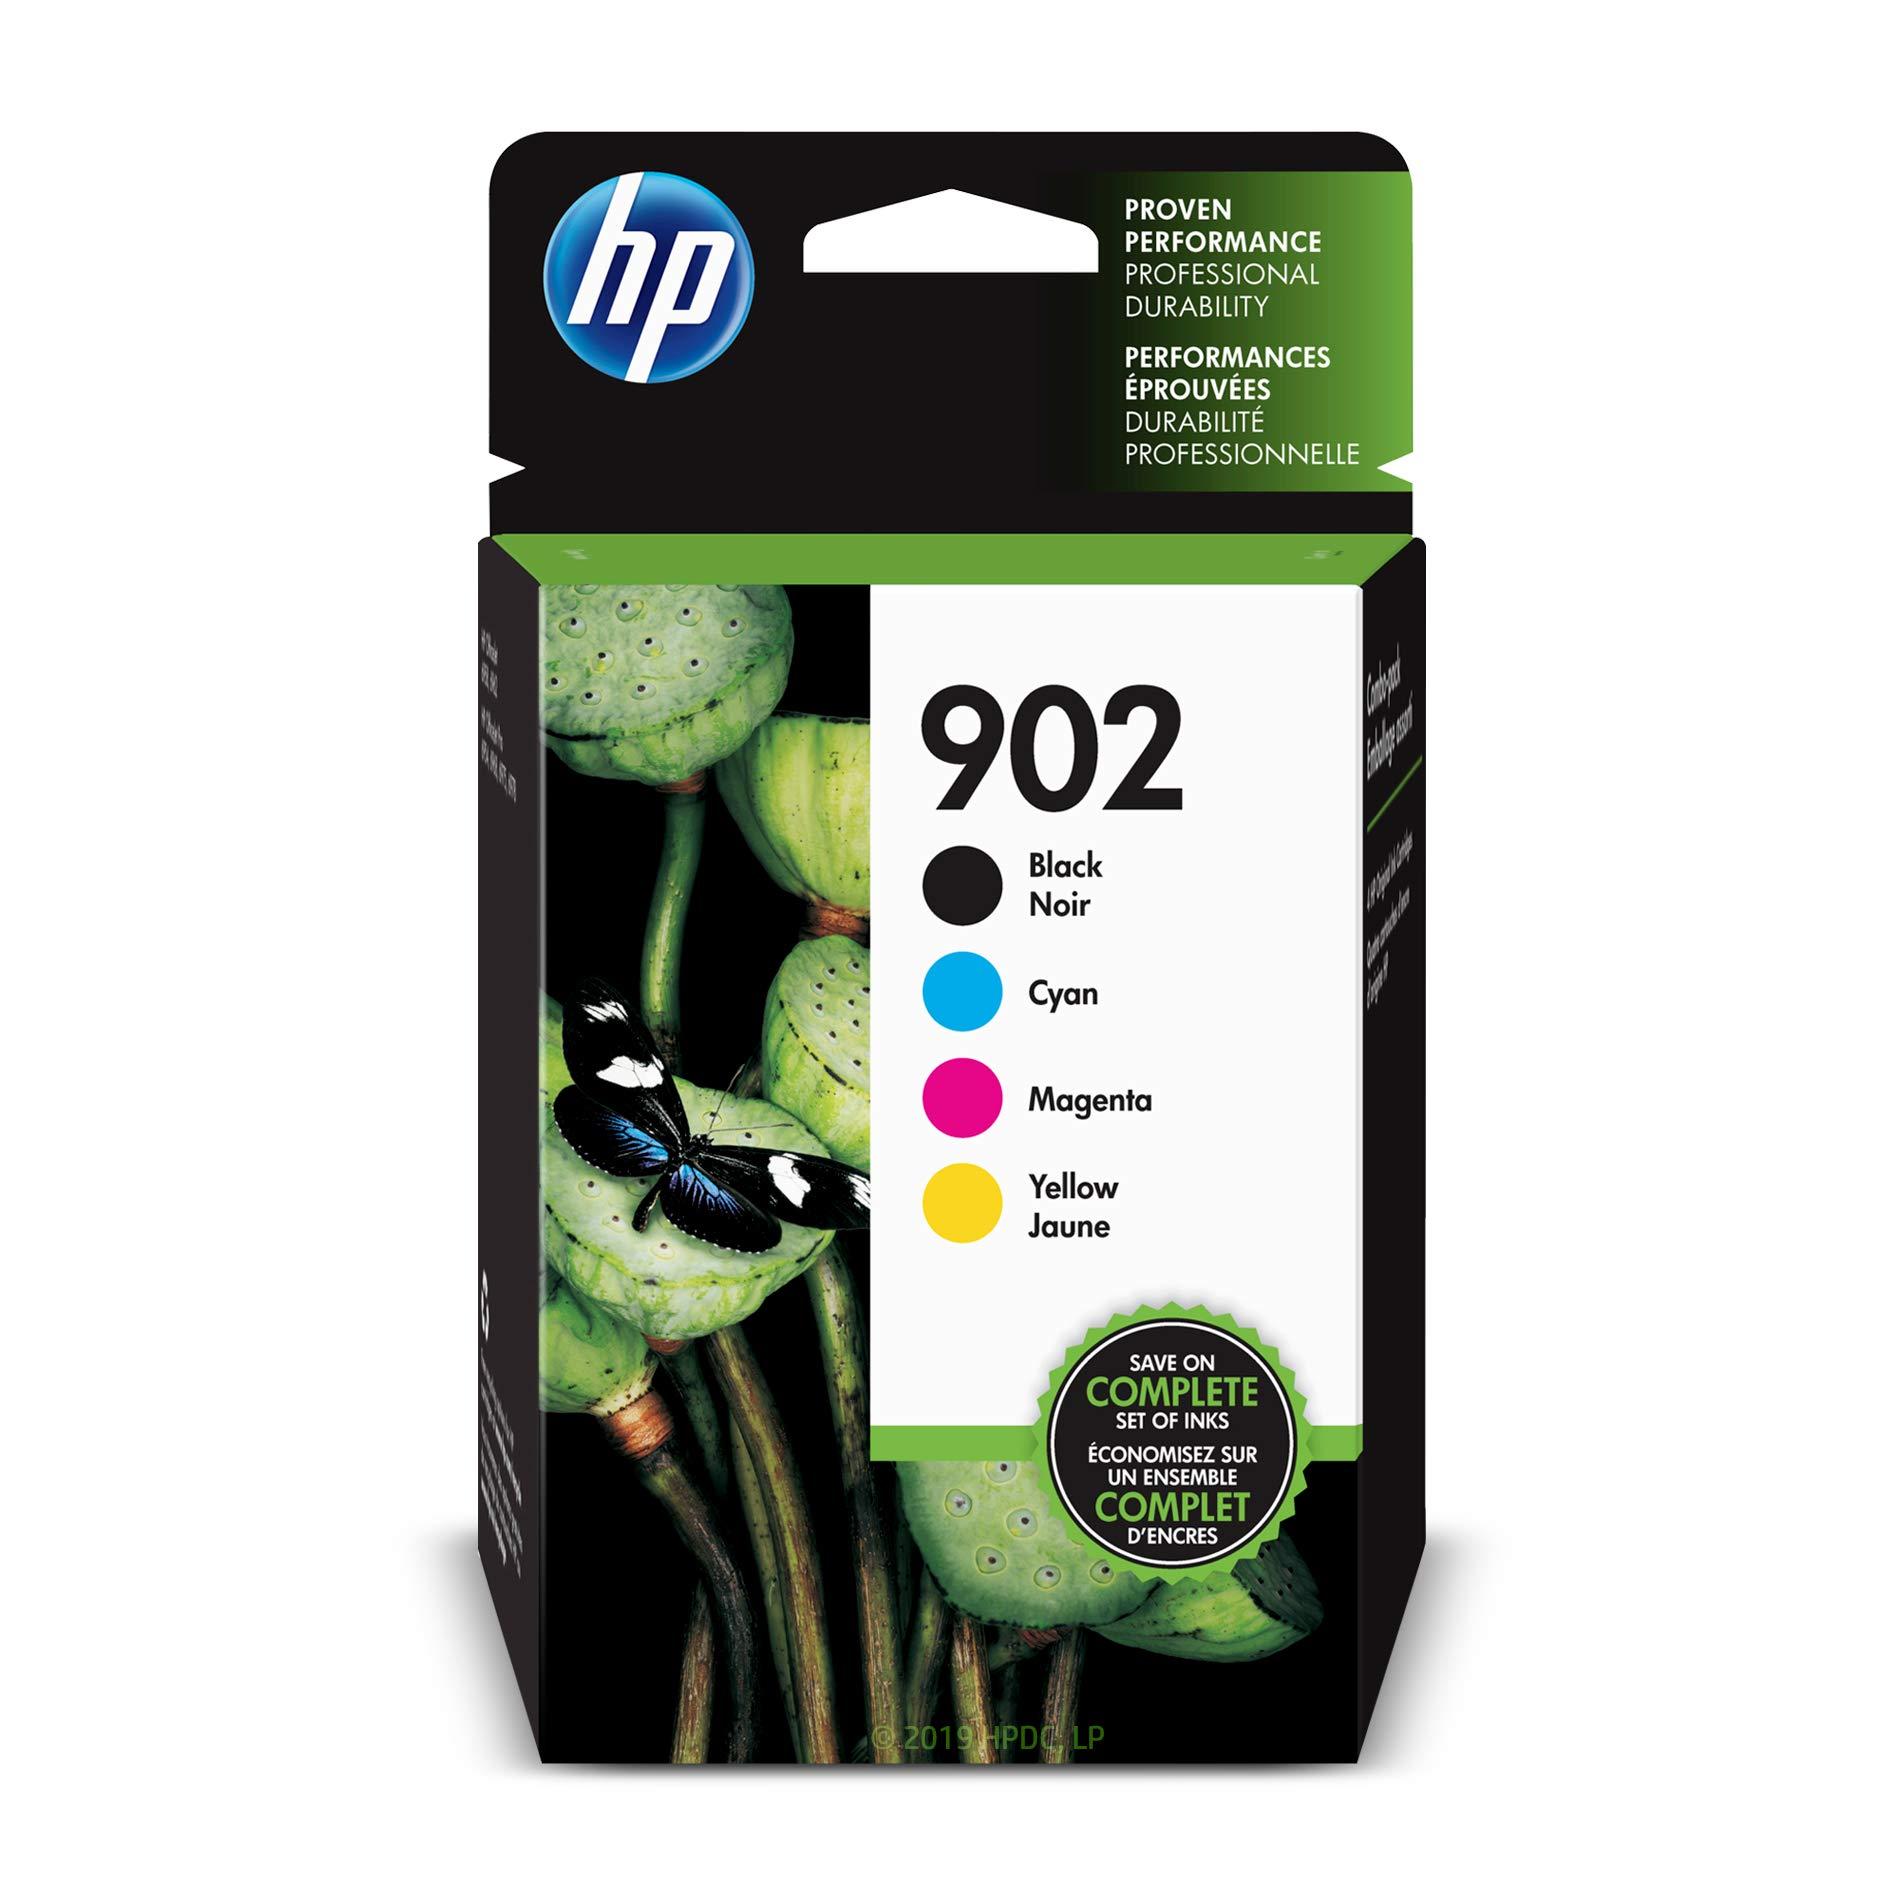 HP 902 | 4 Ink Cartridges | Black, Cyan, Magenta, Yellow | T6L98AN, T6L86AN, T6L90AN, T6L94AN by HP